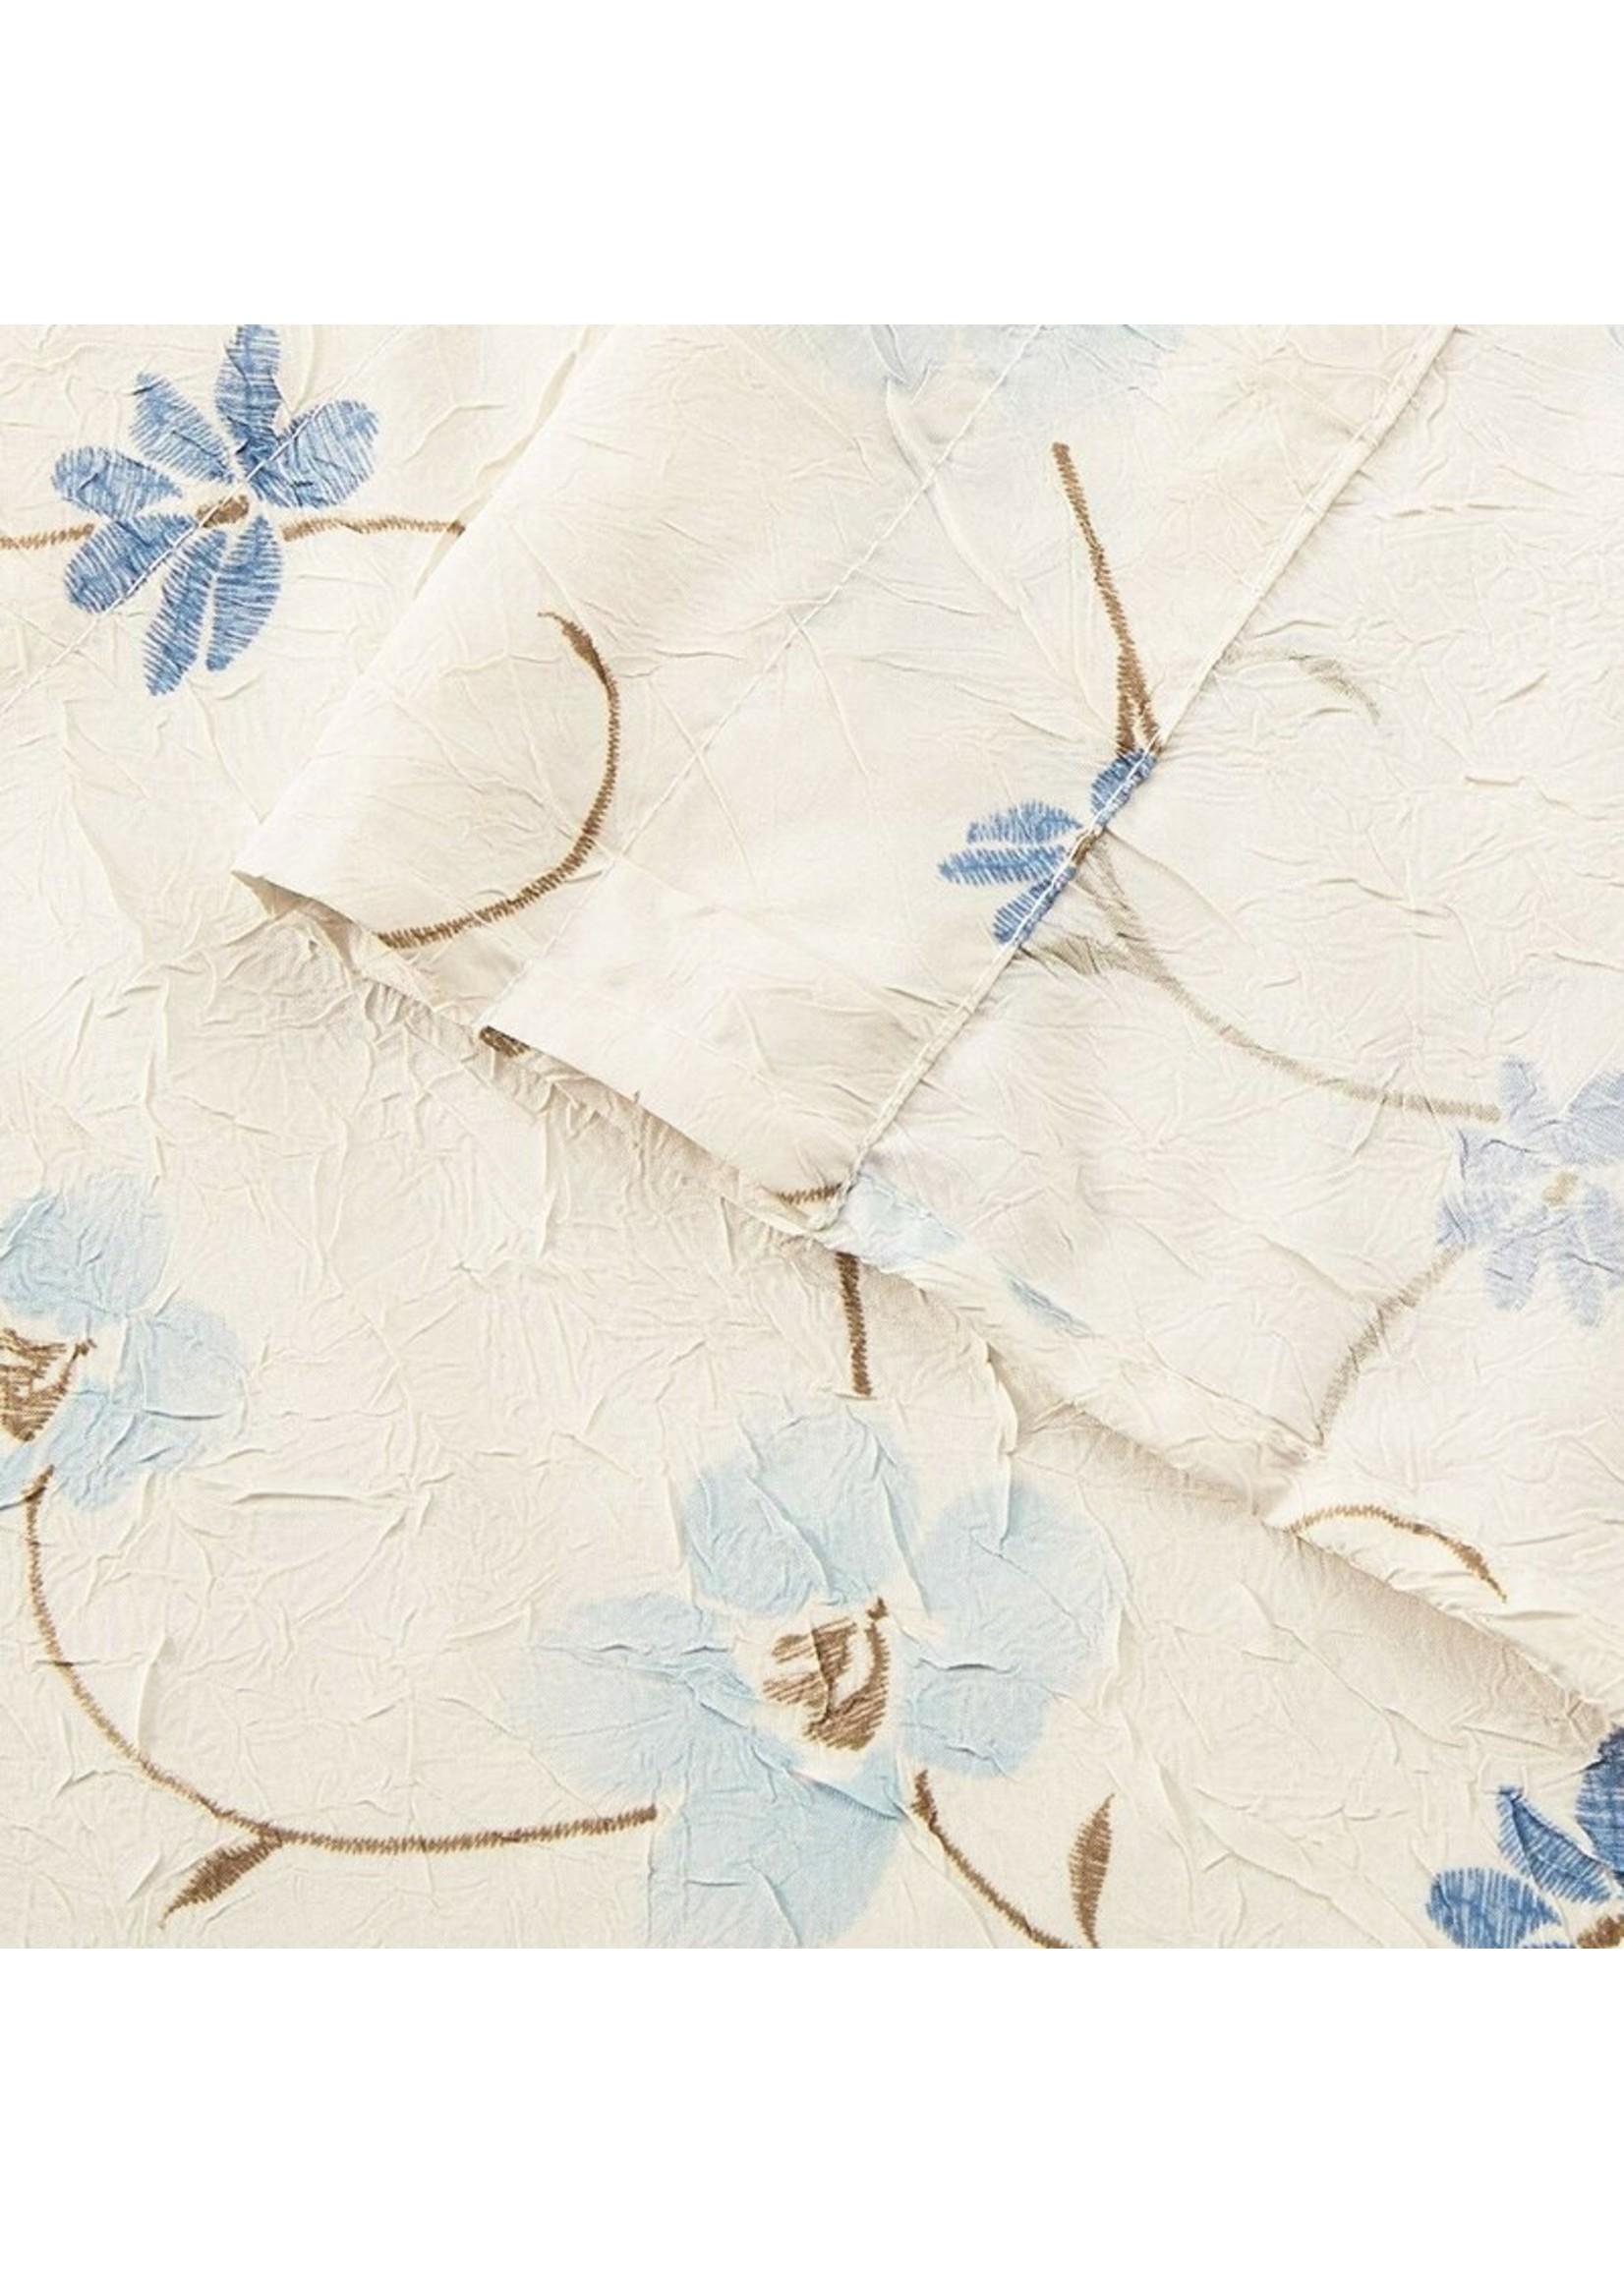 "*Elsberry Crushed Taffeta Open Floral Print 48"" Valance"